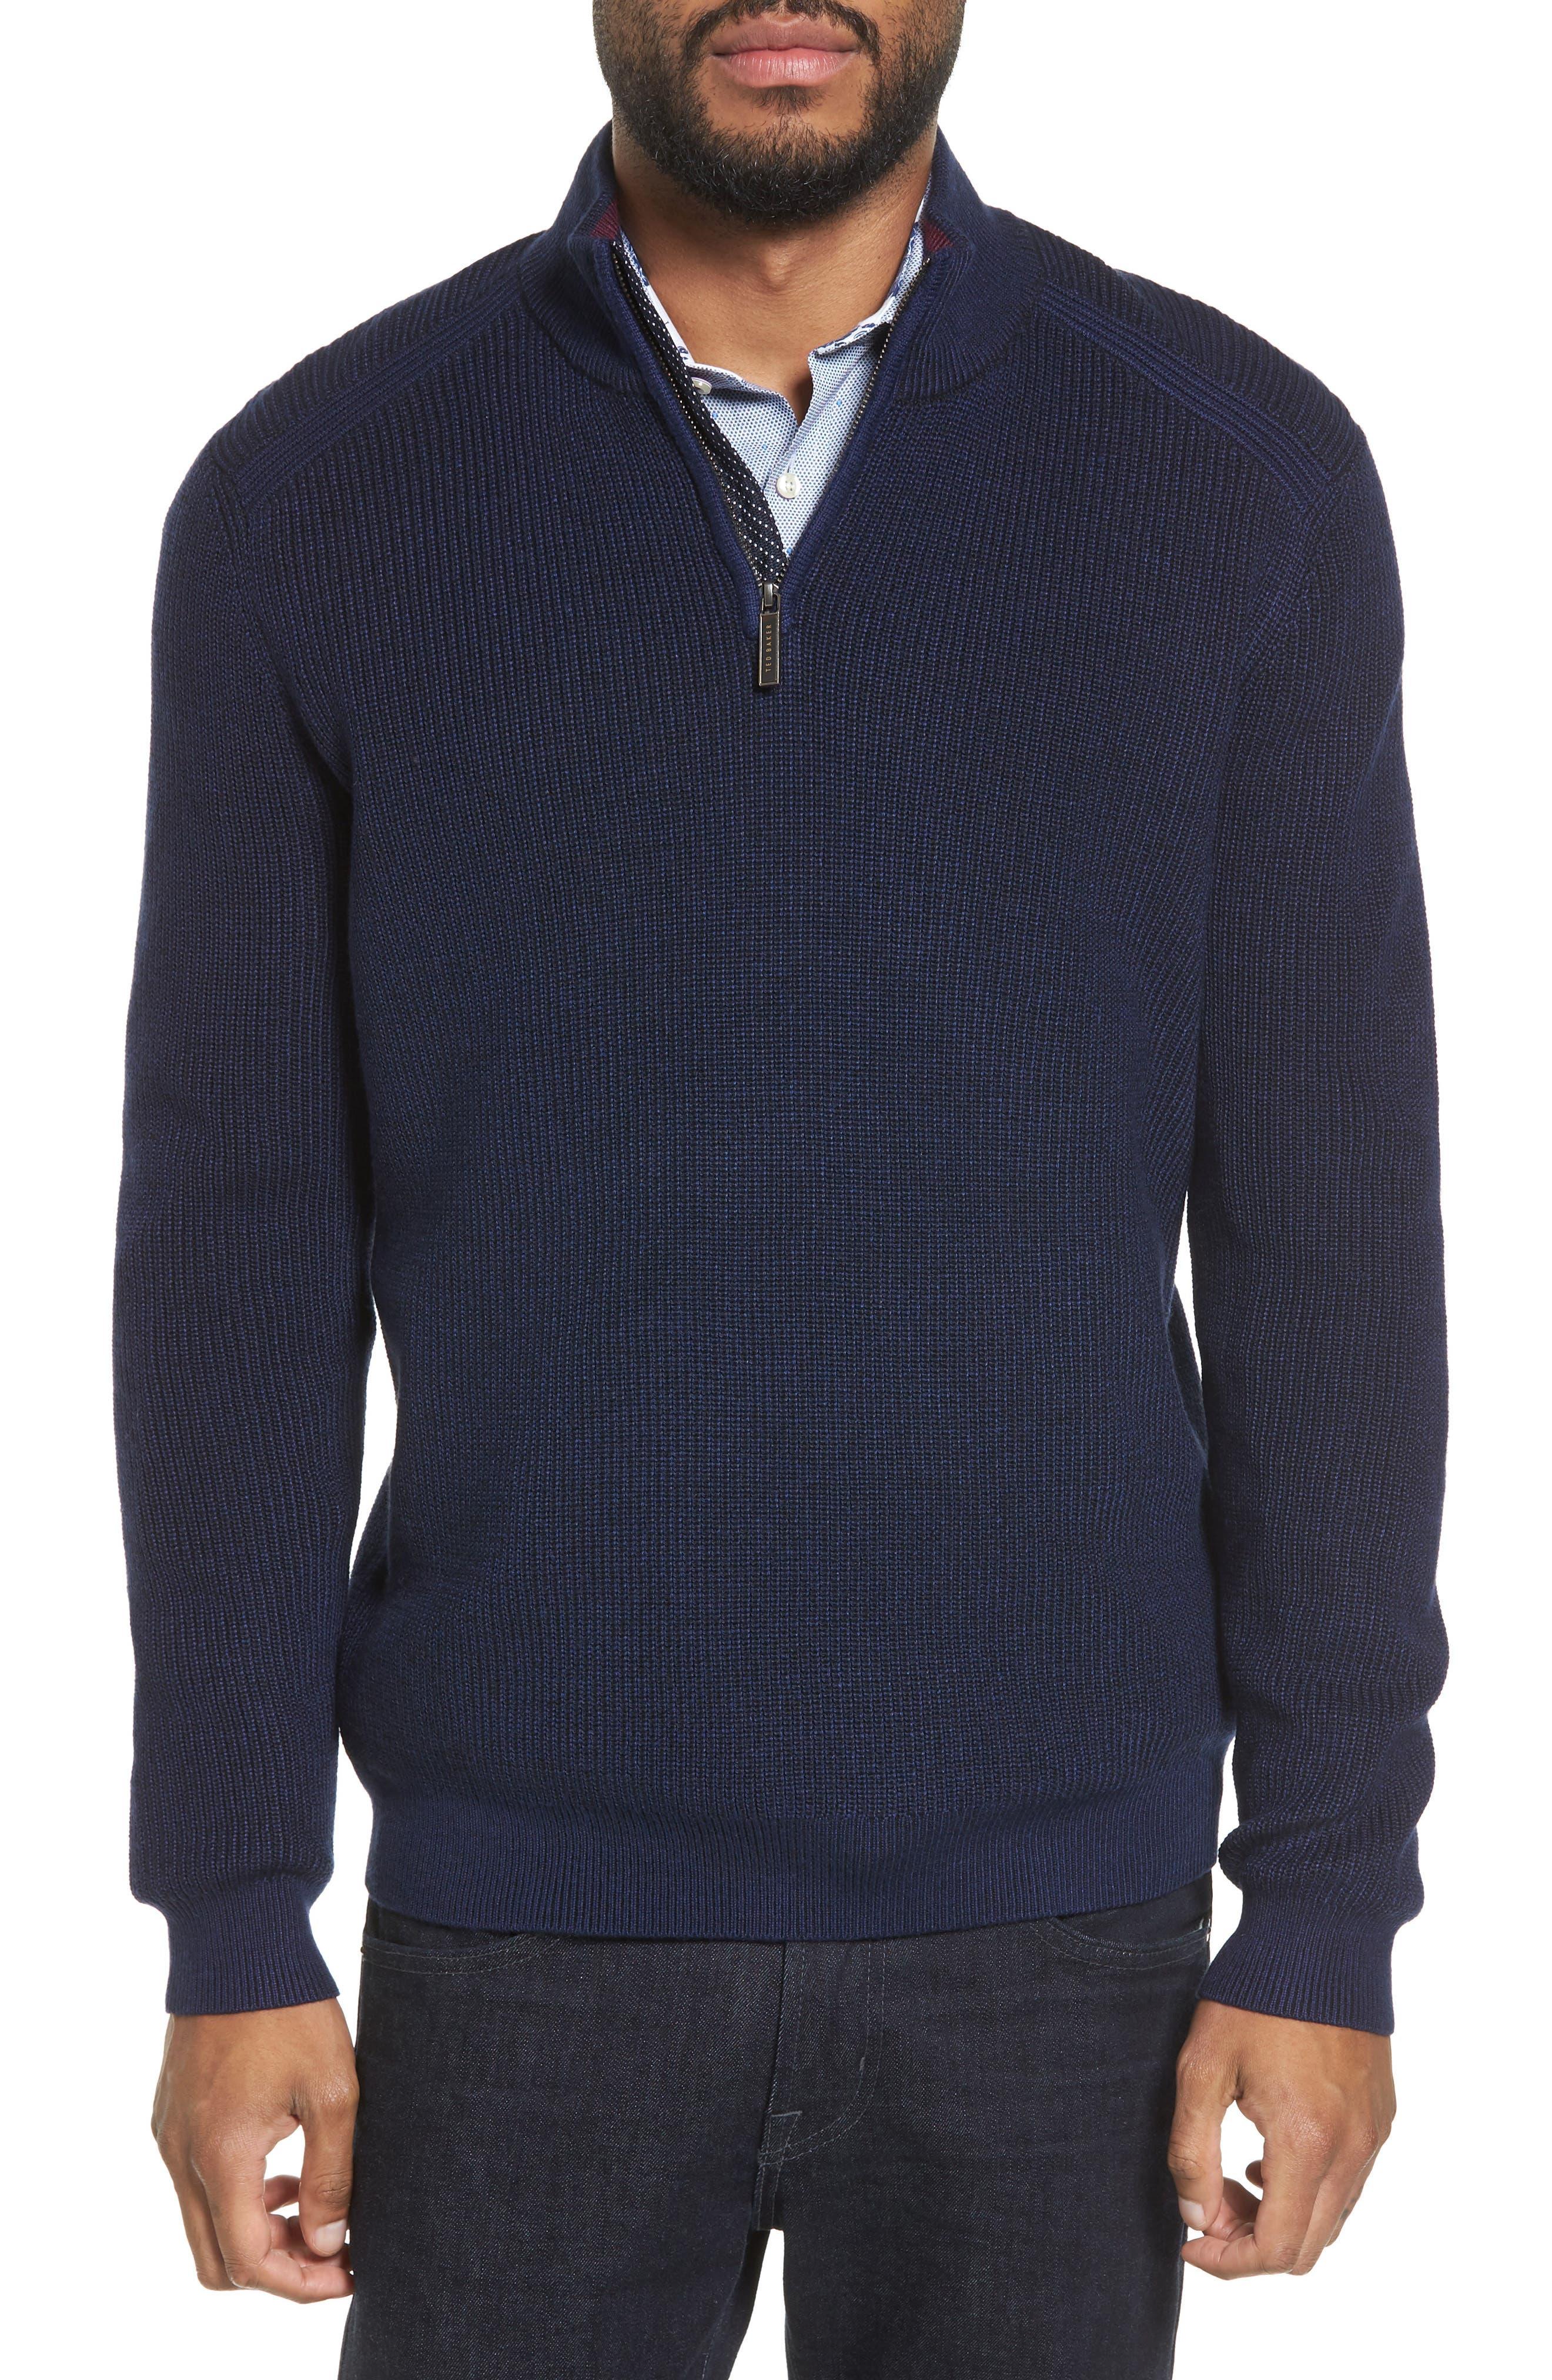 Main Image - Ted Baker London Stach Quarter Zip Sweater